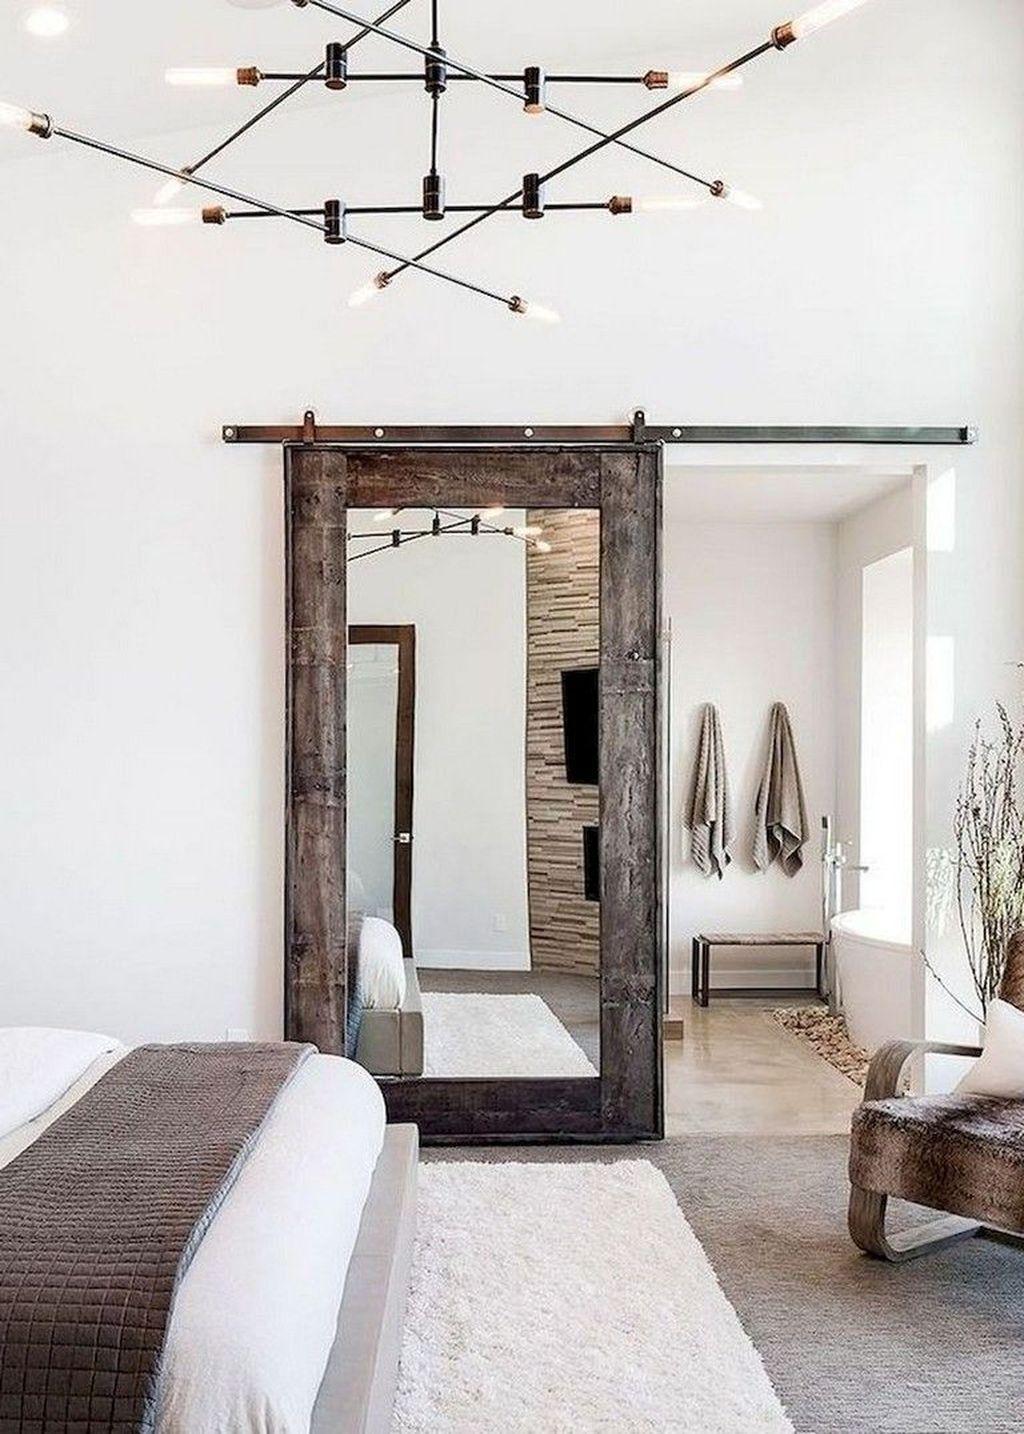 38 Fabulous Modern Farmhouse Bedroom Decorating Ideas #modernfarmhouselivingroom